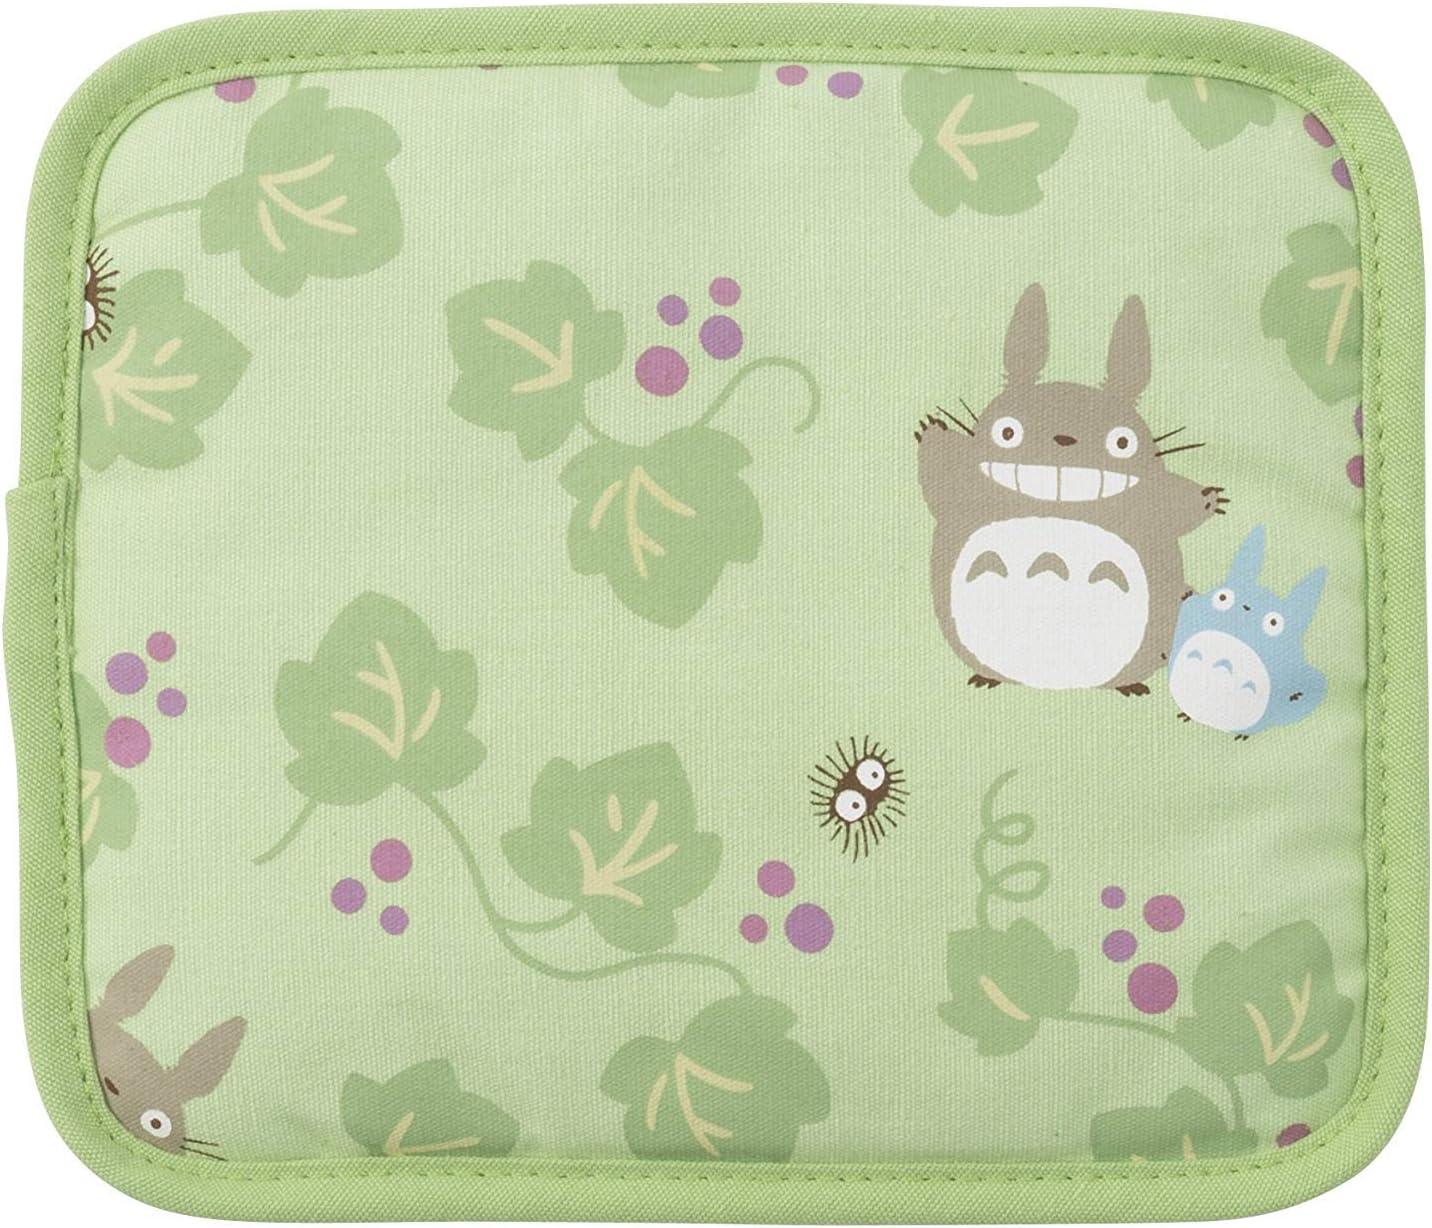 "BLY Studio Ghibli My Neighbor Totoro Pot laying""Vineyard"" 1165018000"